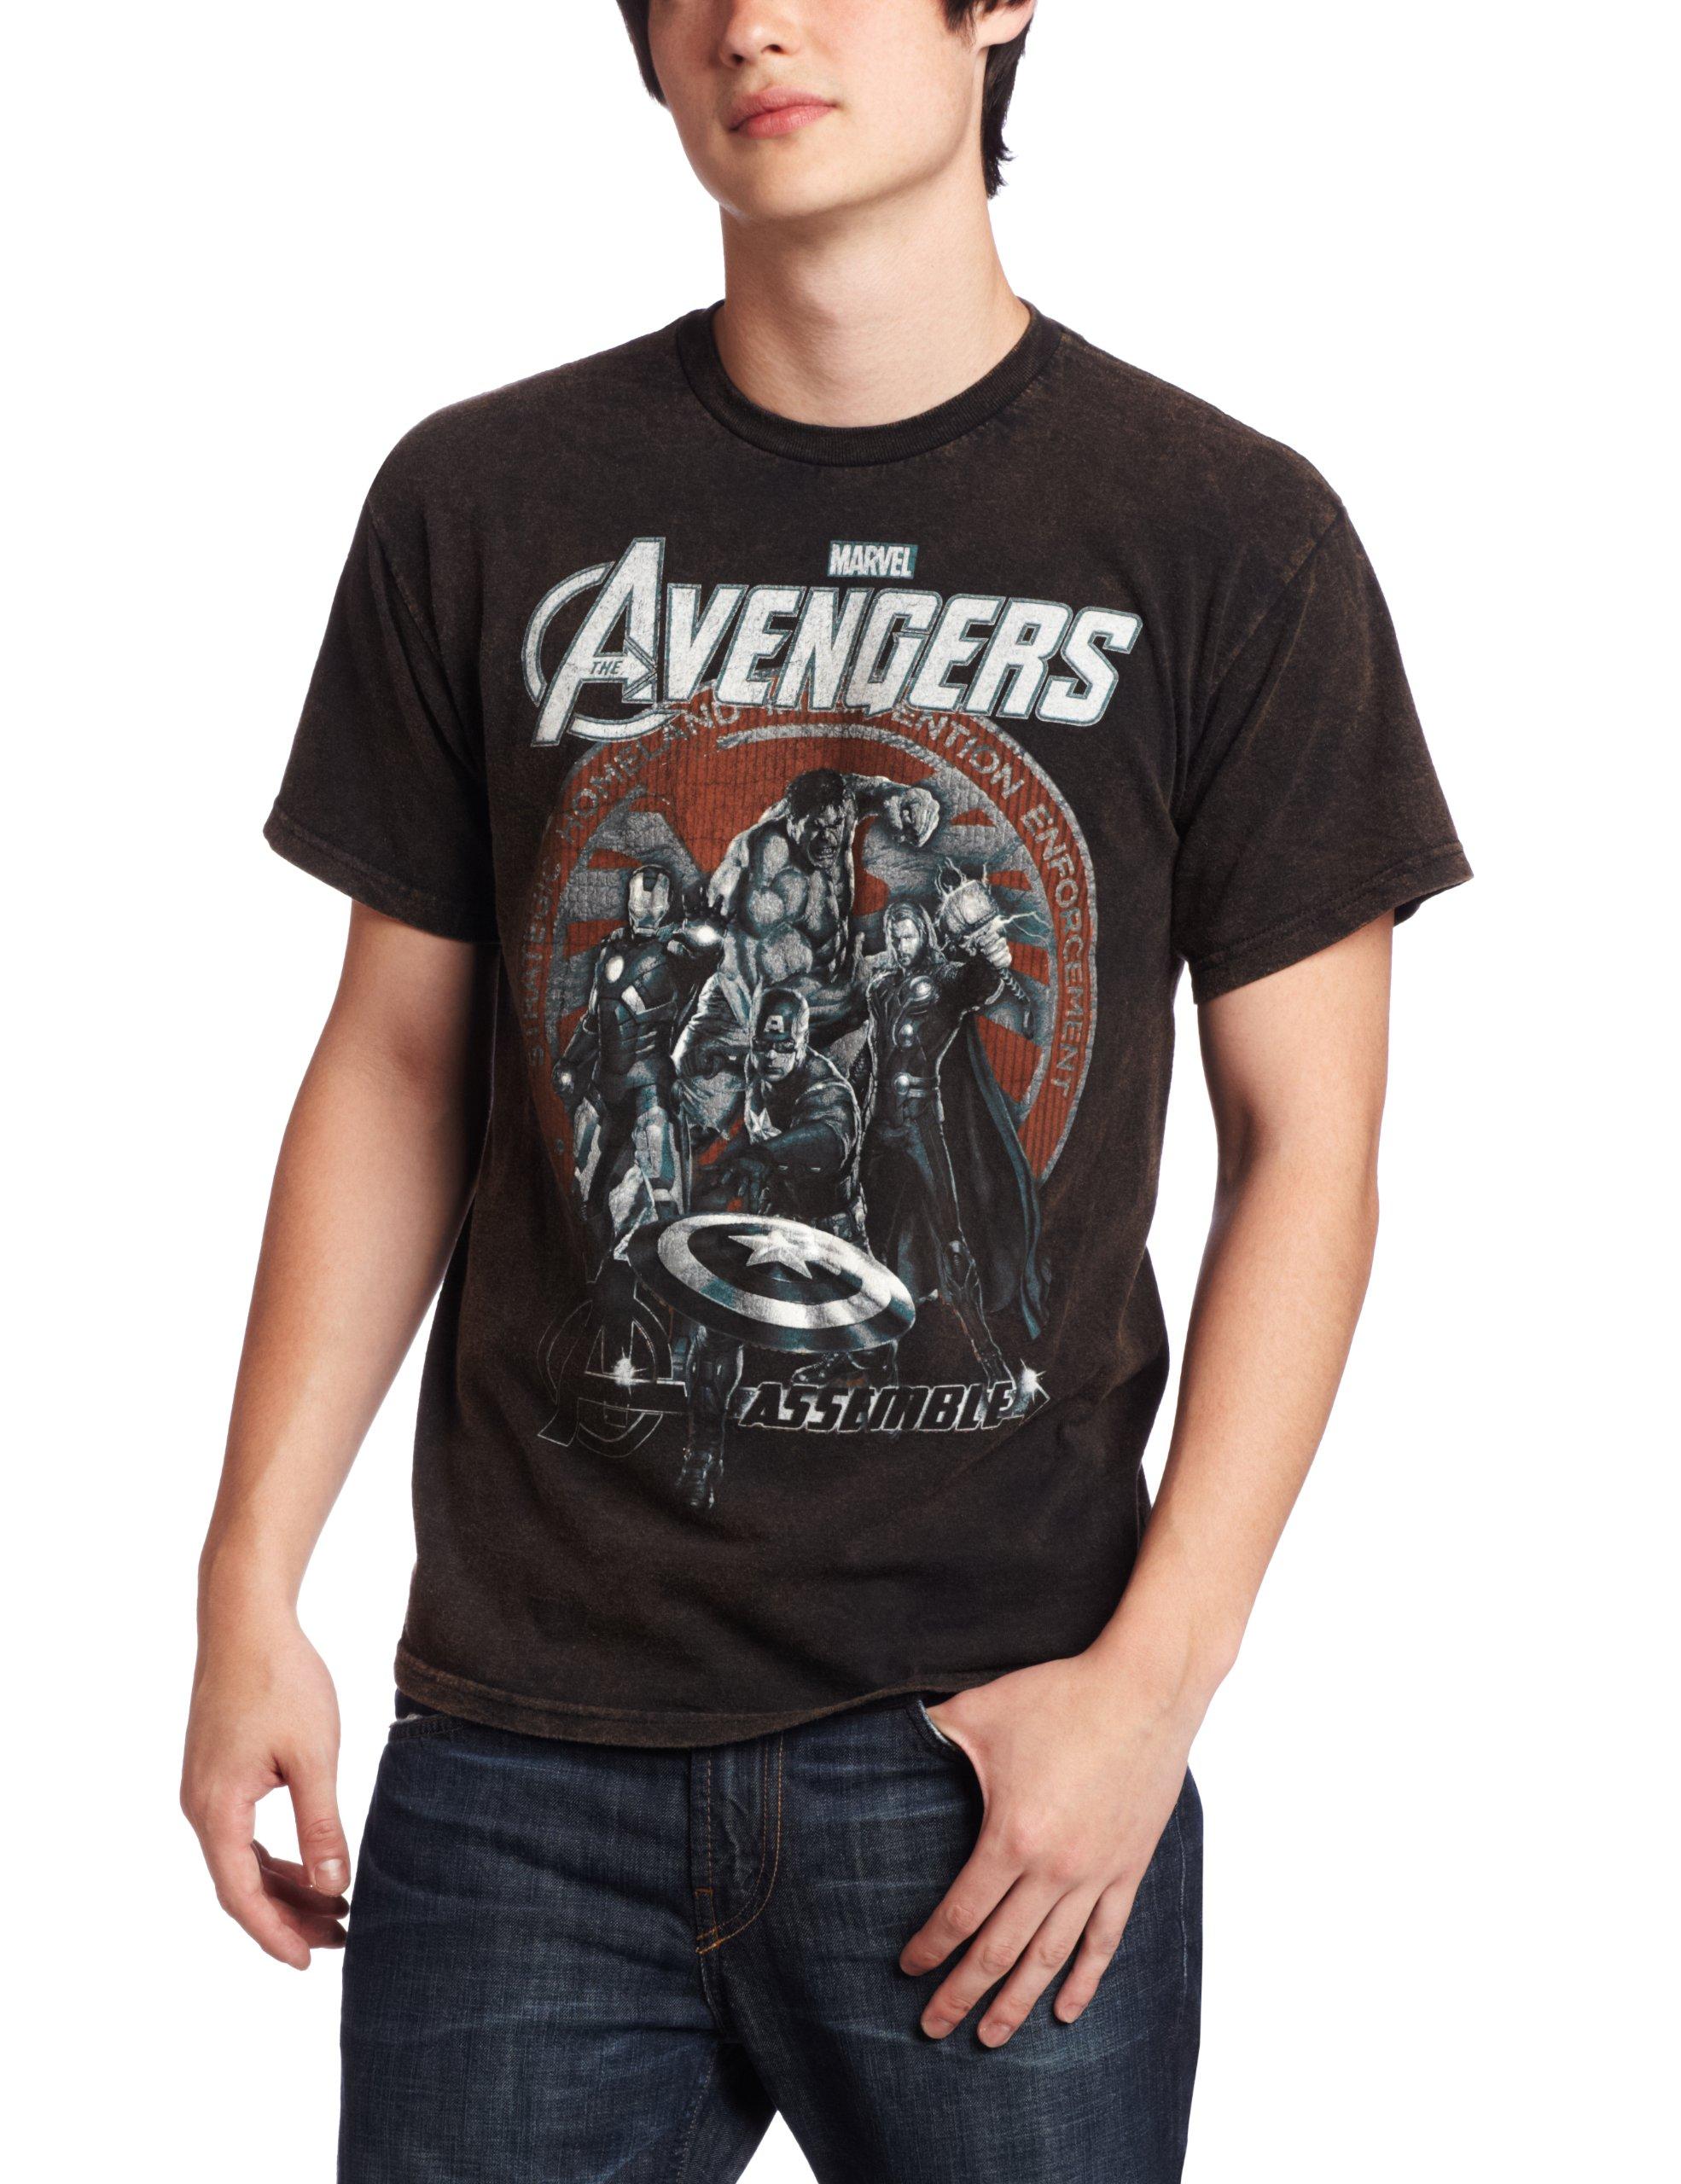 Men's Clothing Humor Funny T Shirt Men Novelty Women Tshirt Avengers Mens Bottle Co T-shirt To Have A Long Historical Standing